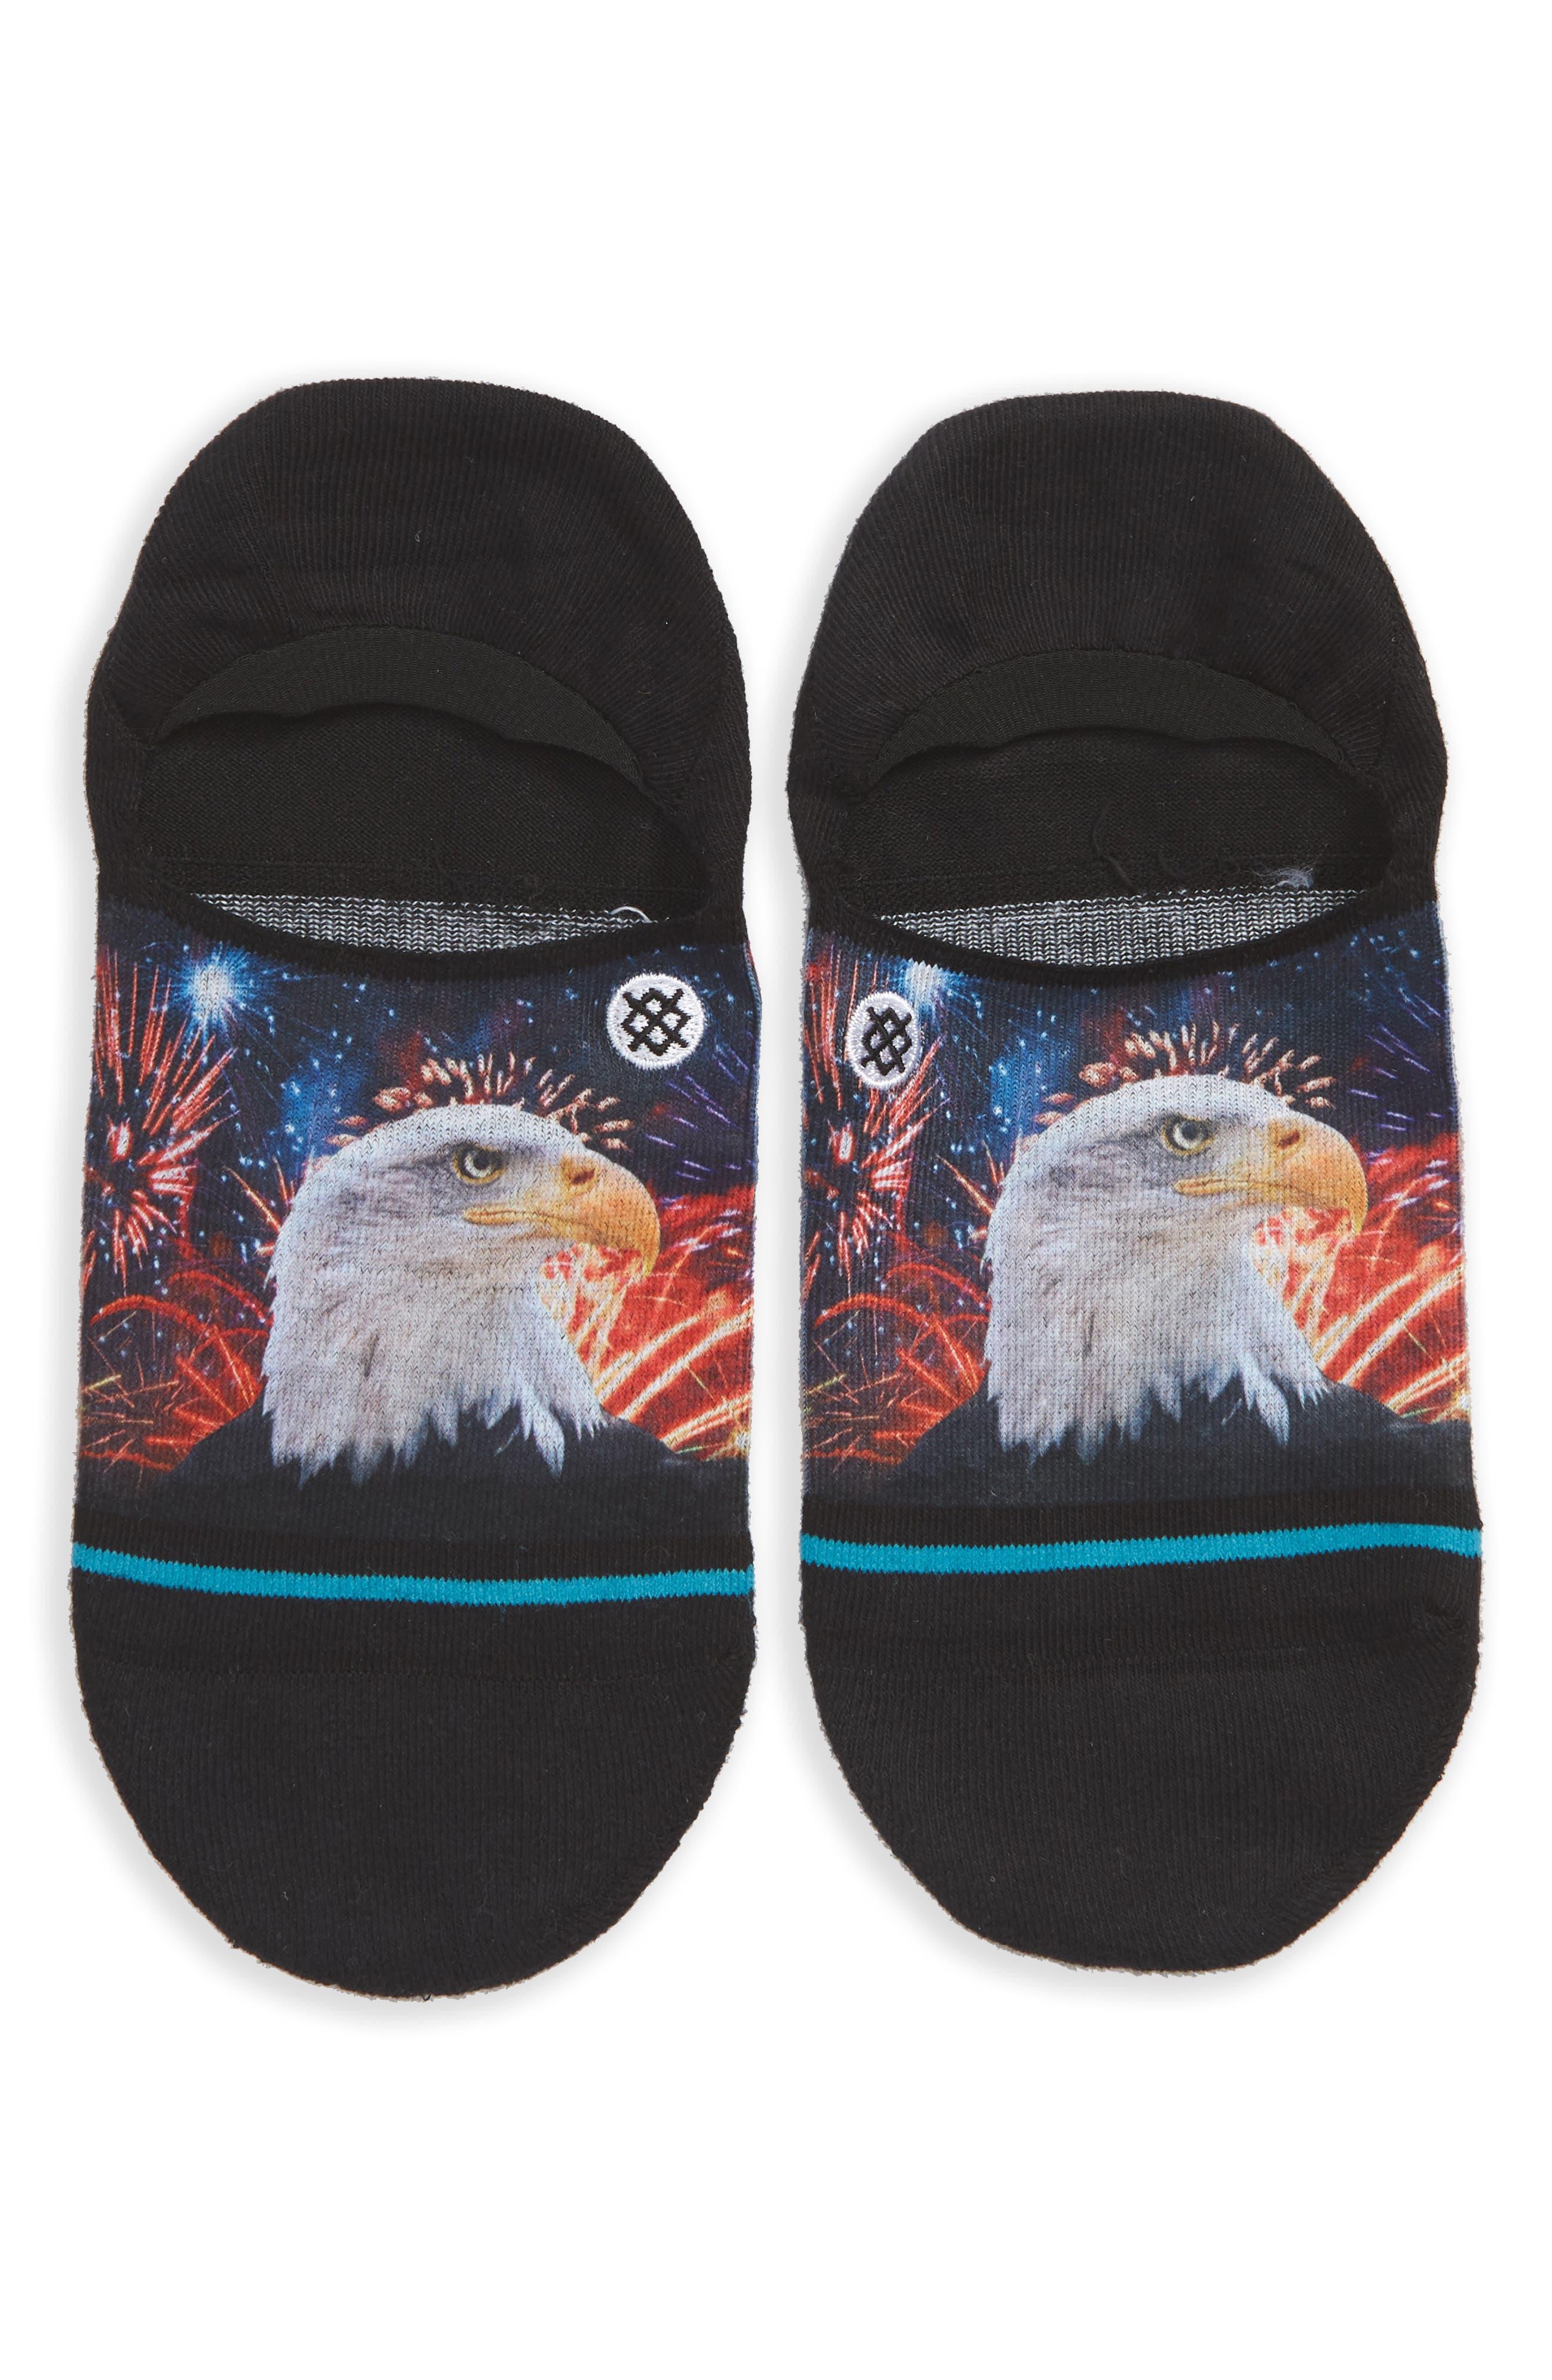 Defender Liner Socks,                             Main thumbnail 1, color,                             Black